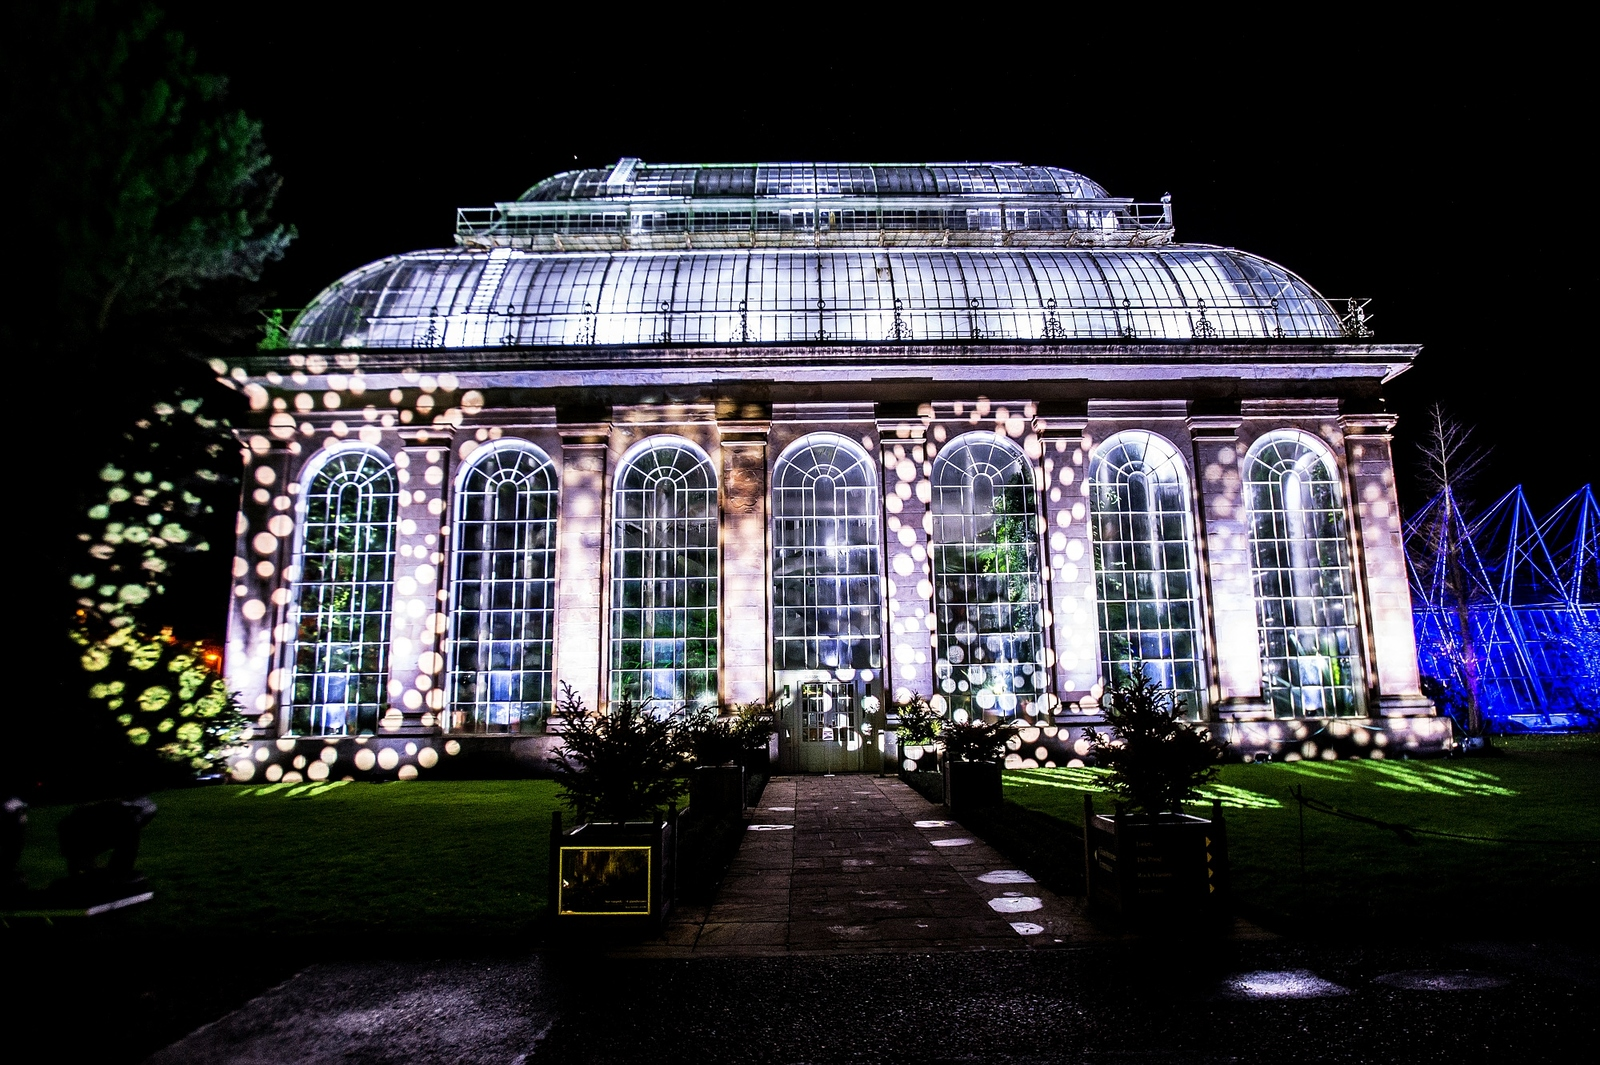 A winter wonderland The Royal Botanic Garden in Edinburgh will